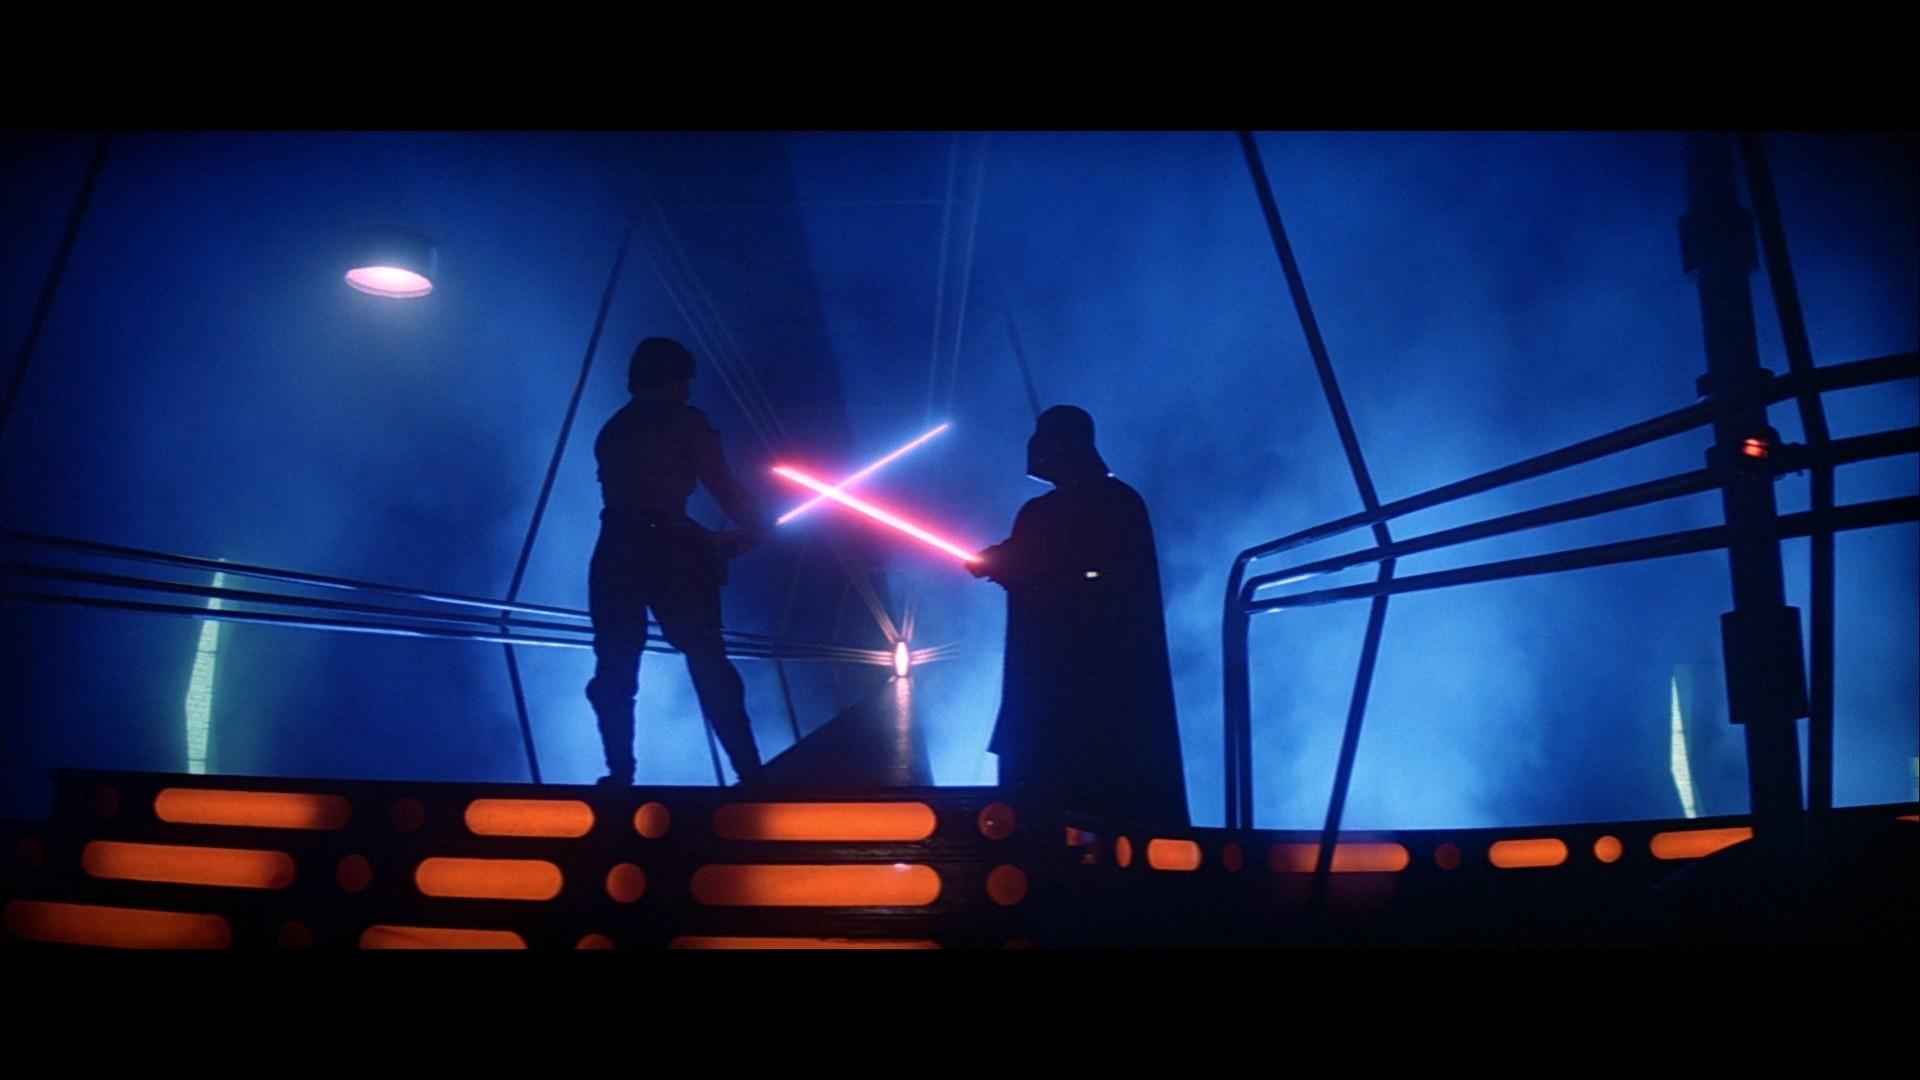 Star Wars Empire Strikes Back Wallpaper (71+ Images